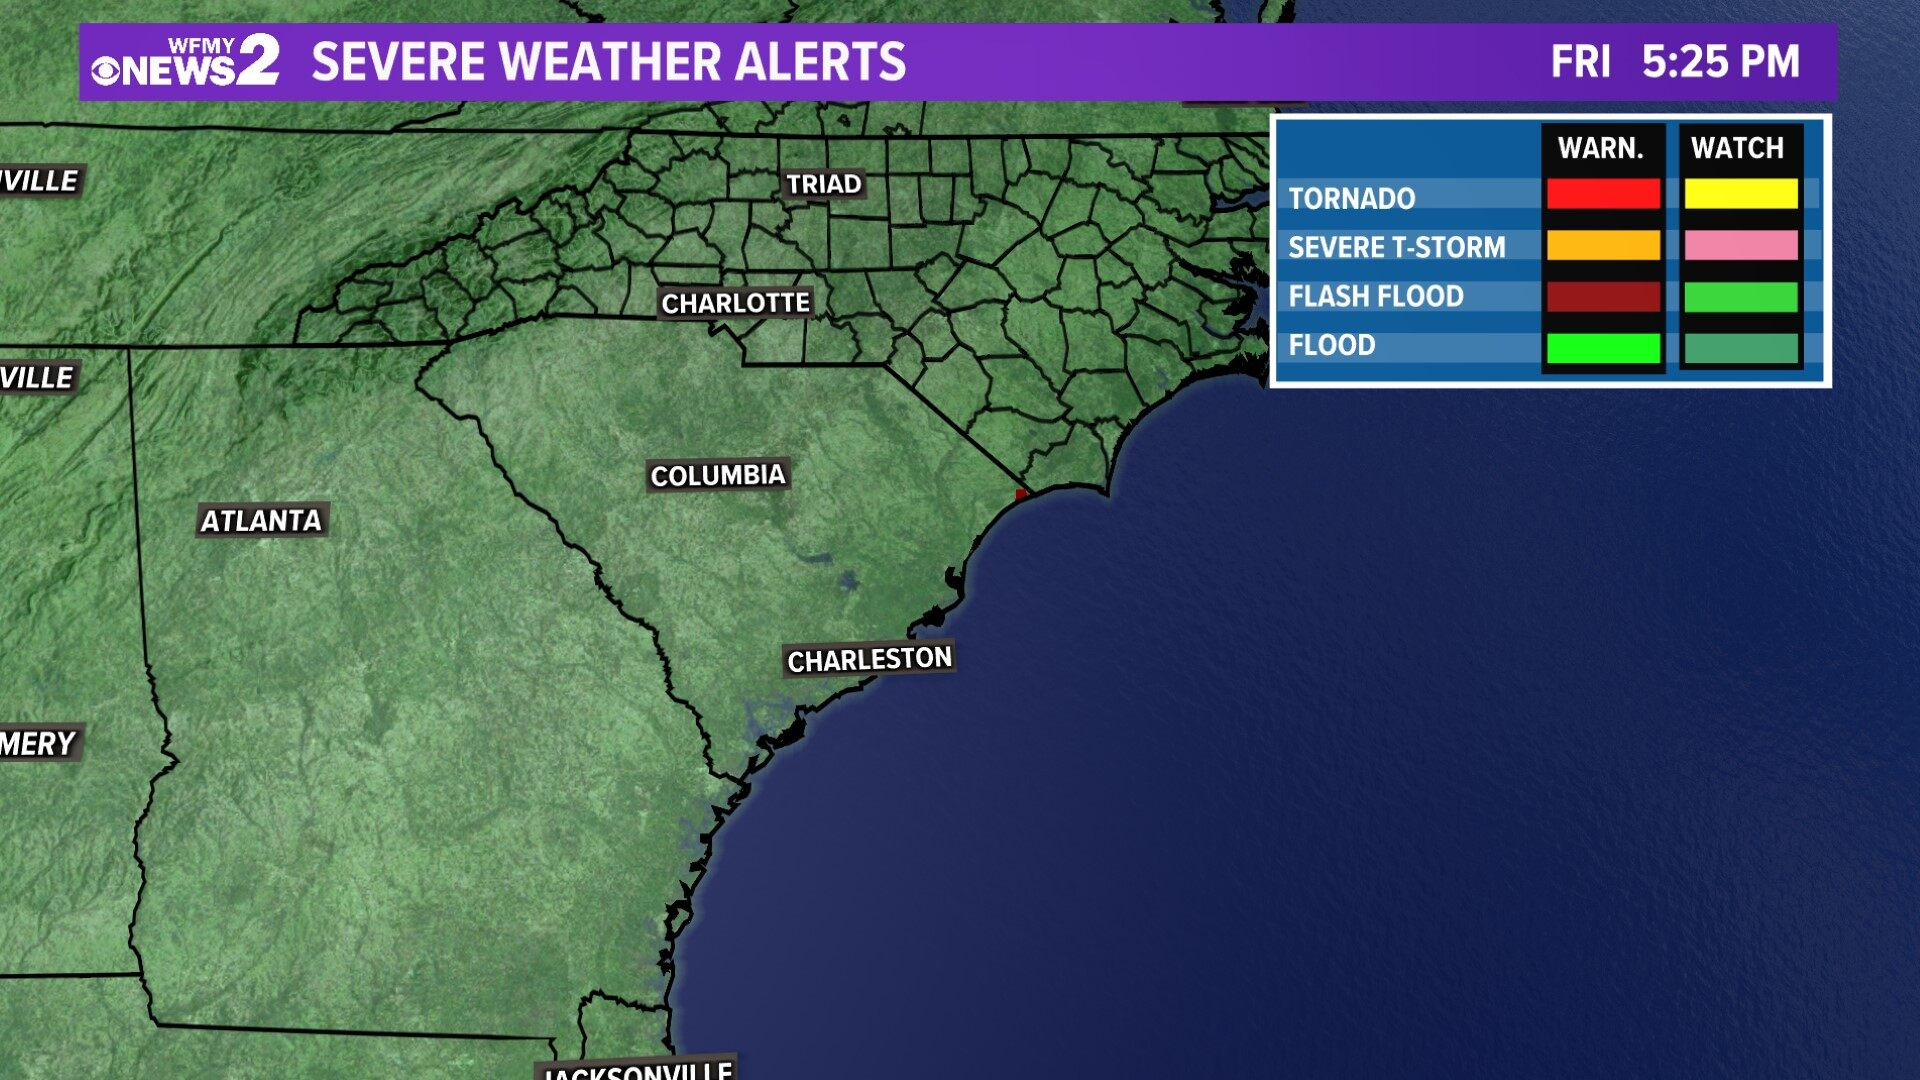 Carolinas Severe Weather Alerts